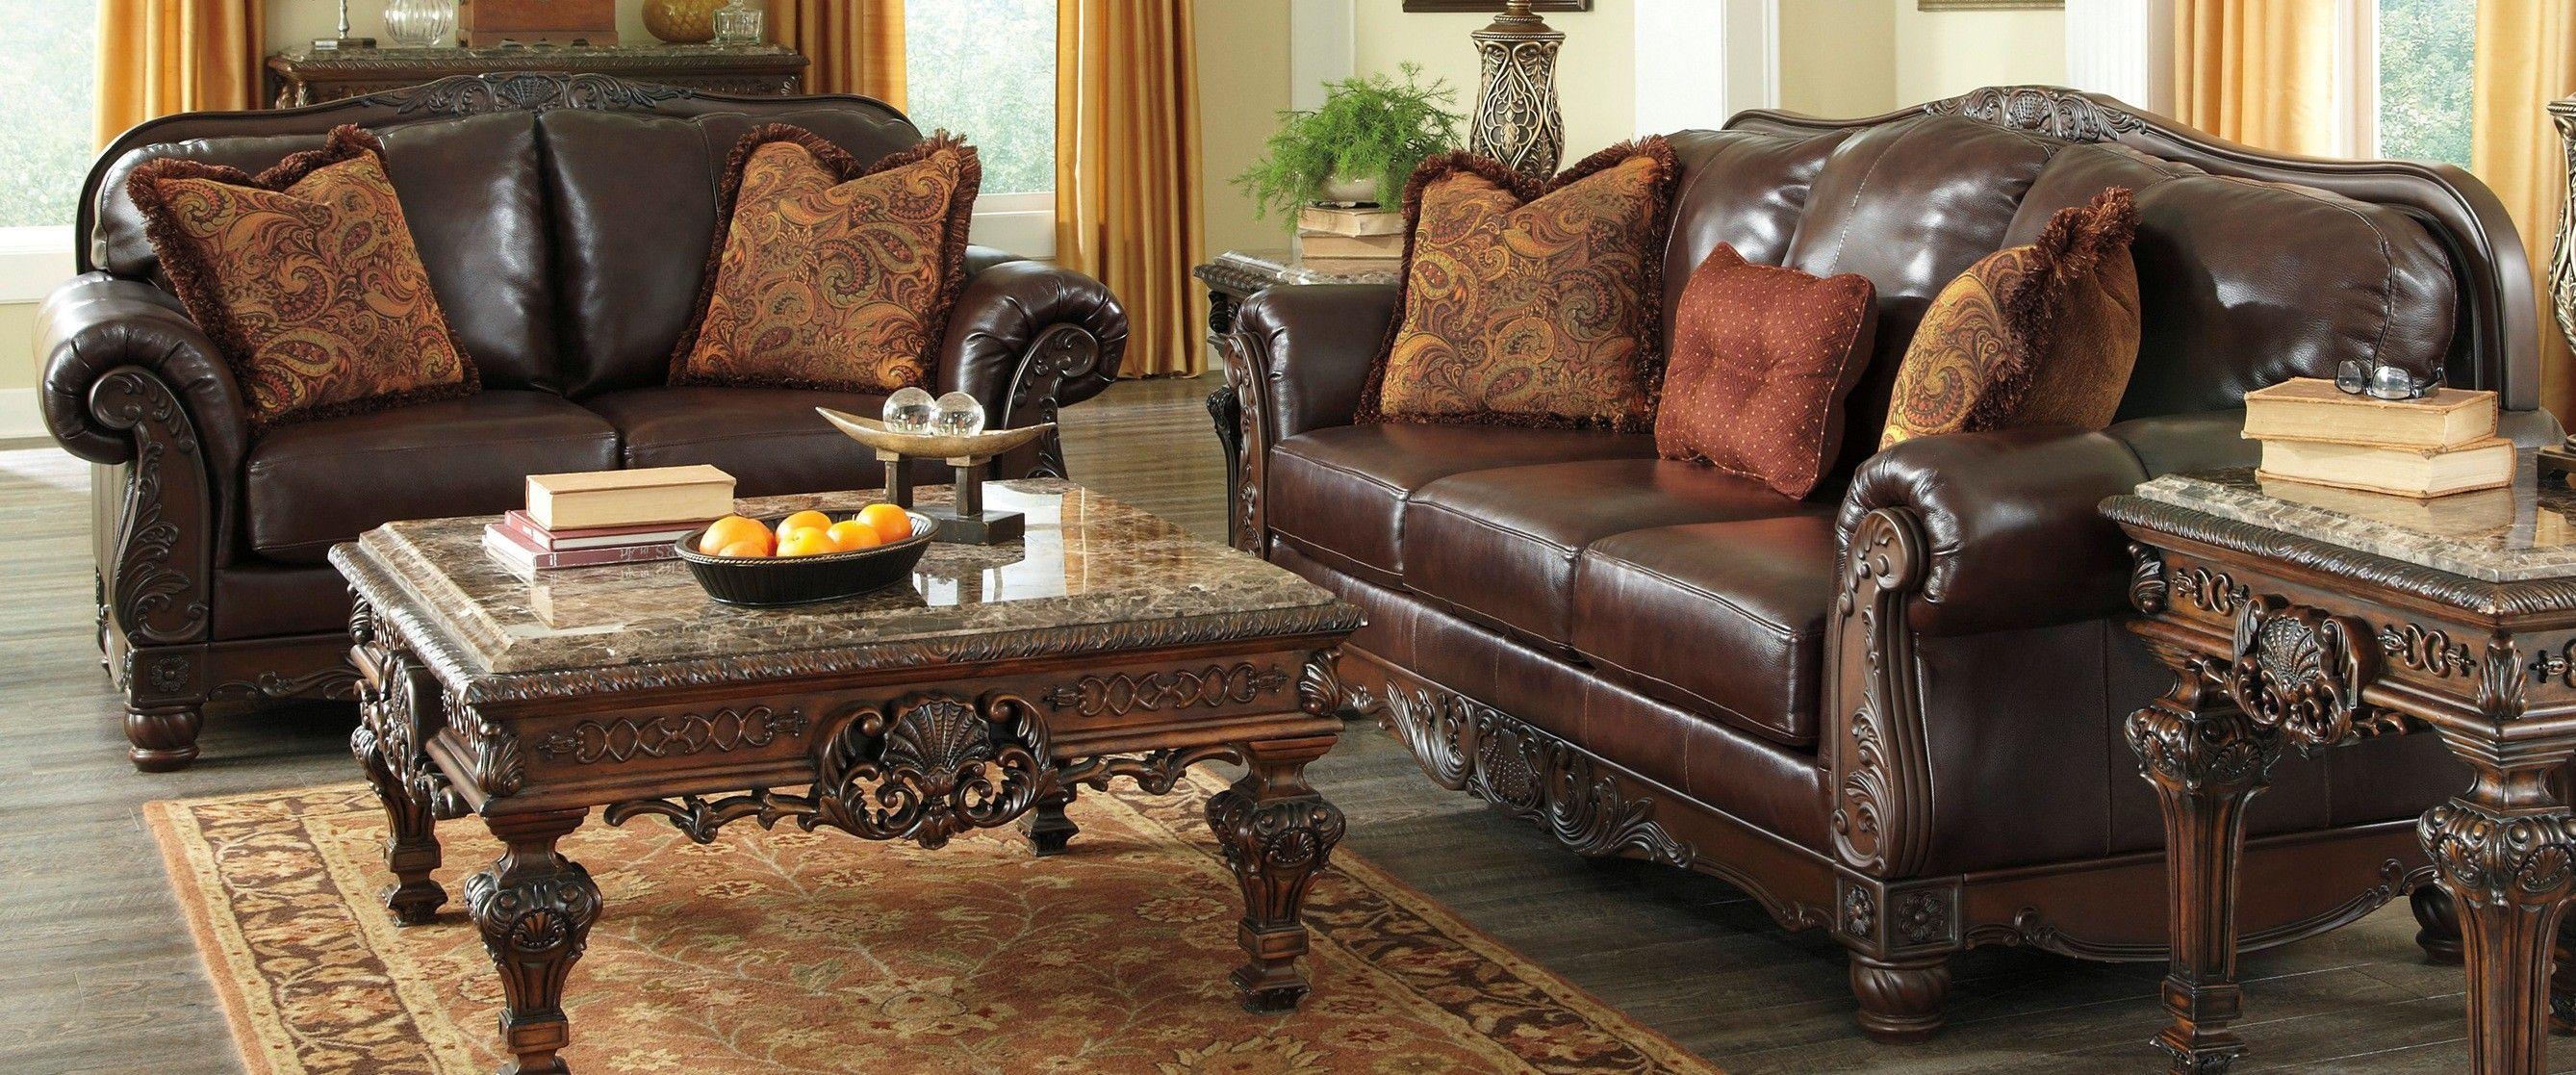 Ashley Furniture Living Room Sets Prices Art Wall Buy 2310038 2310035 Set North Shore Plus Coffee Bringithomefurniture Com